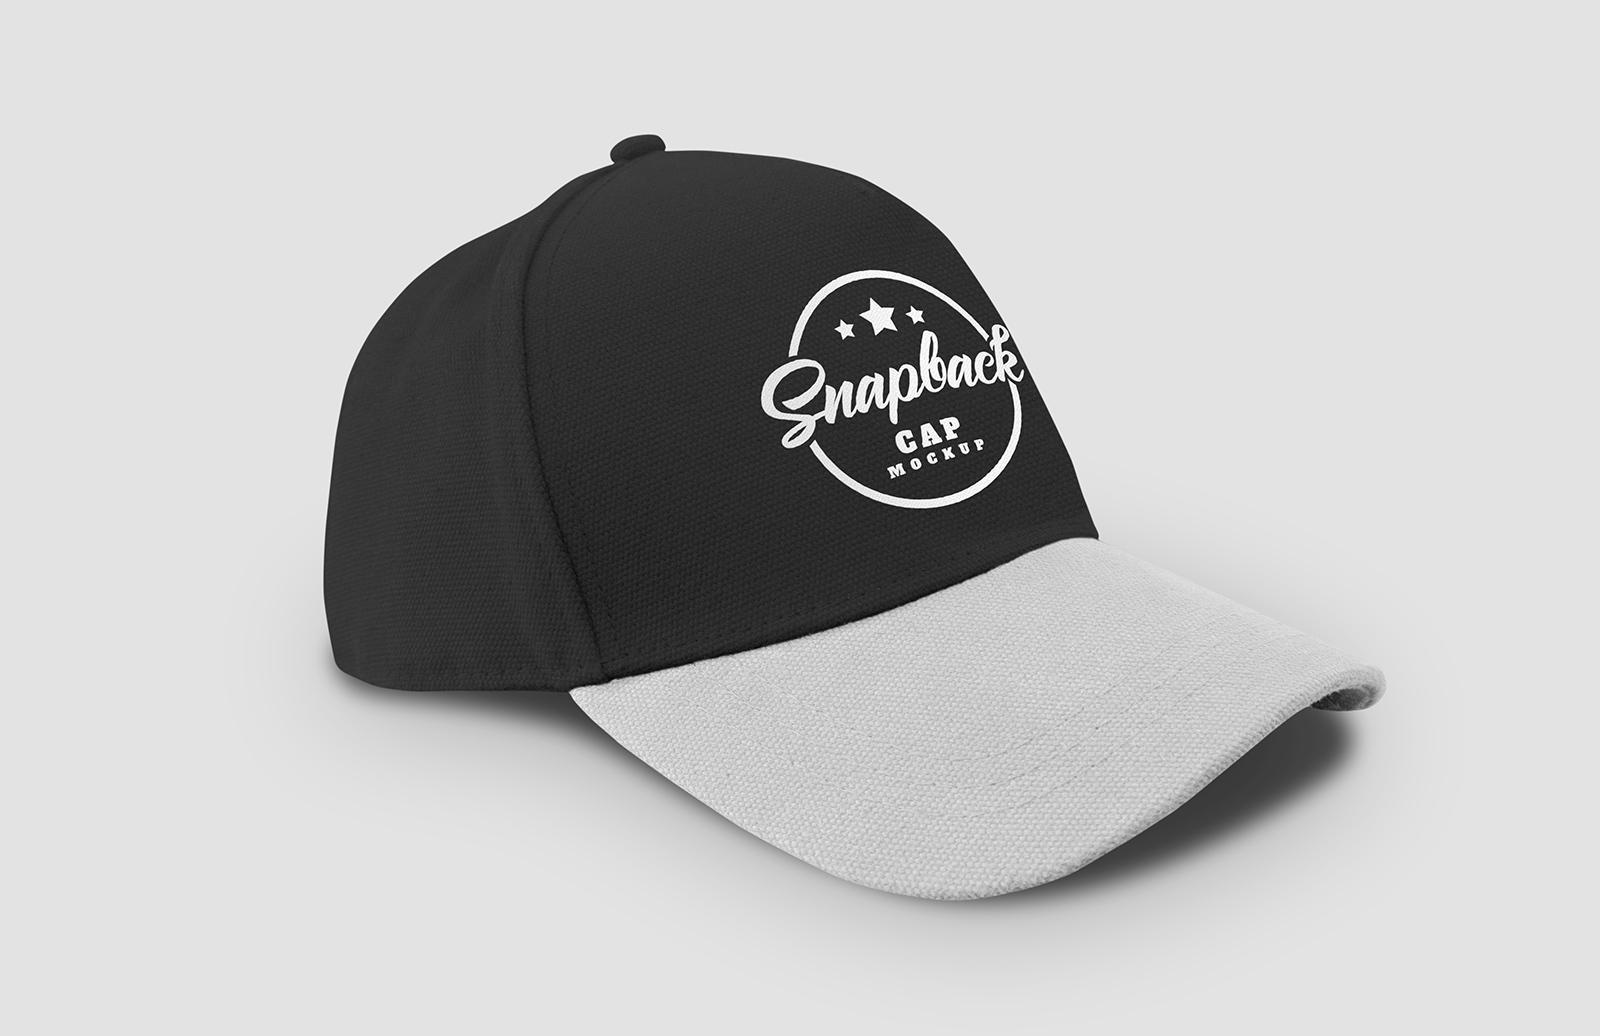 Snapback Baseball Cap Preview 1A